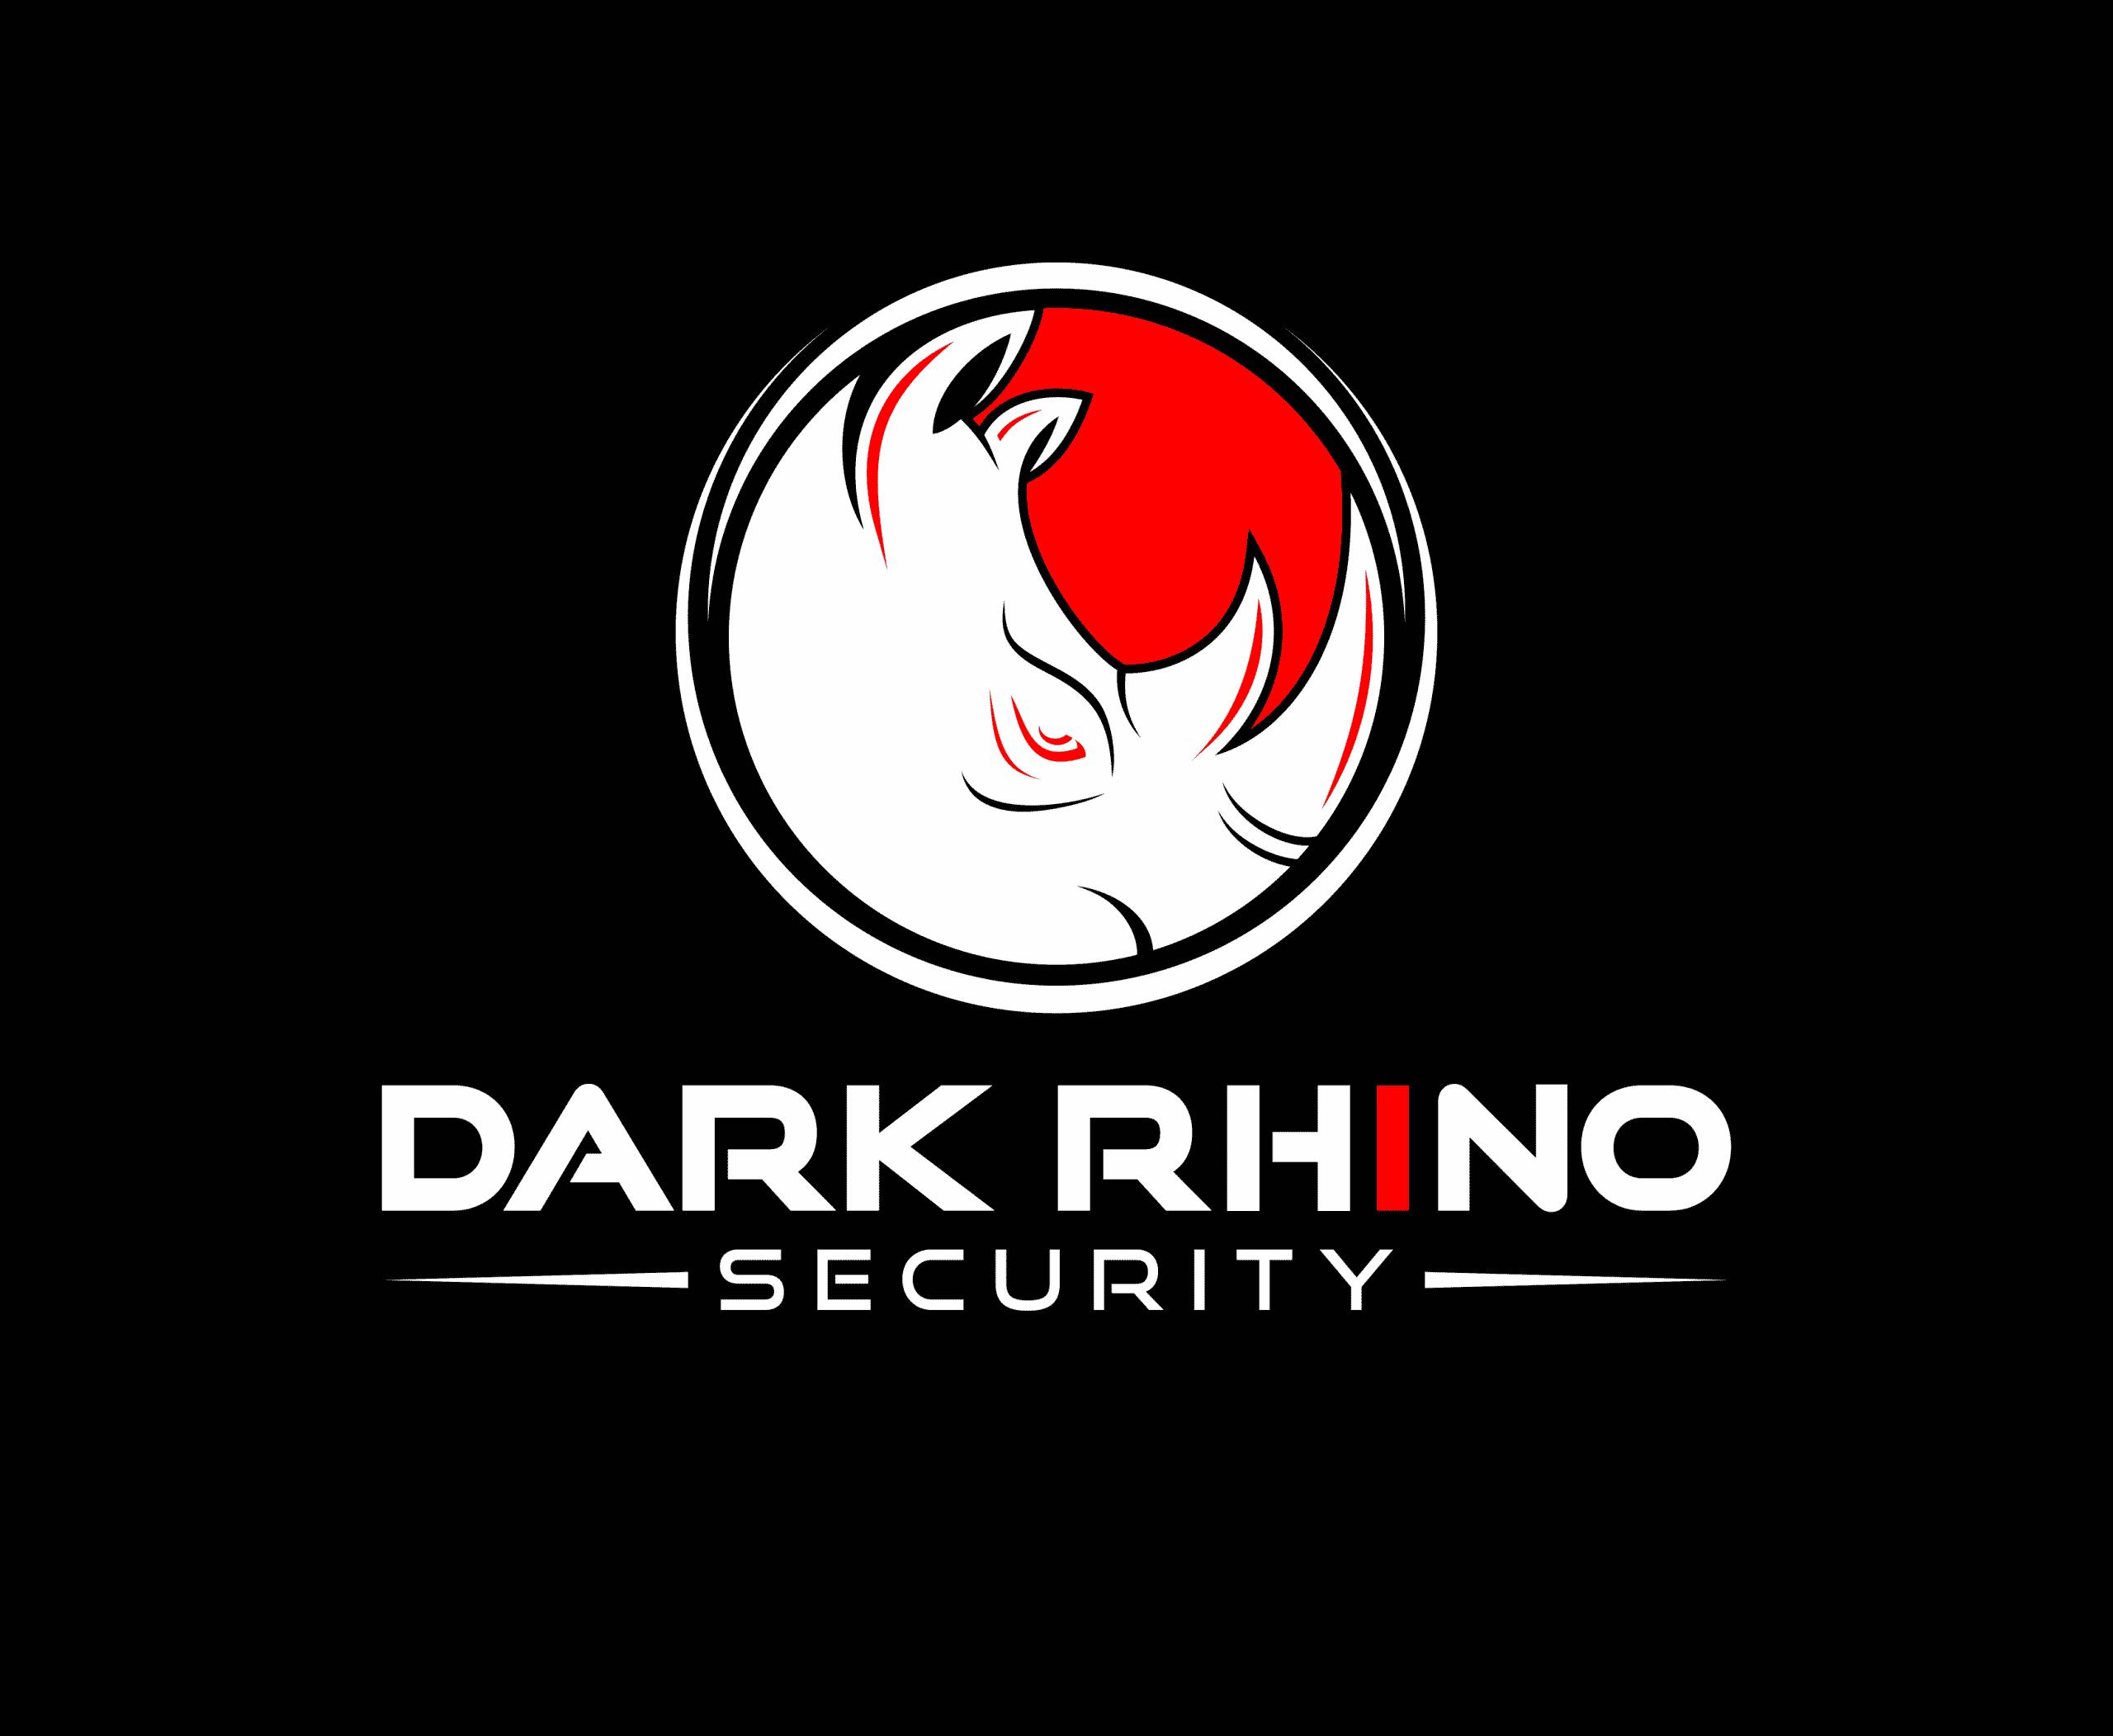 Dark Rhino Security white and red logo on black background